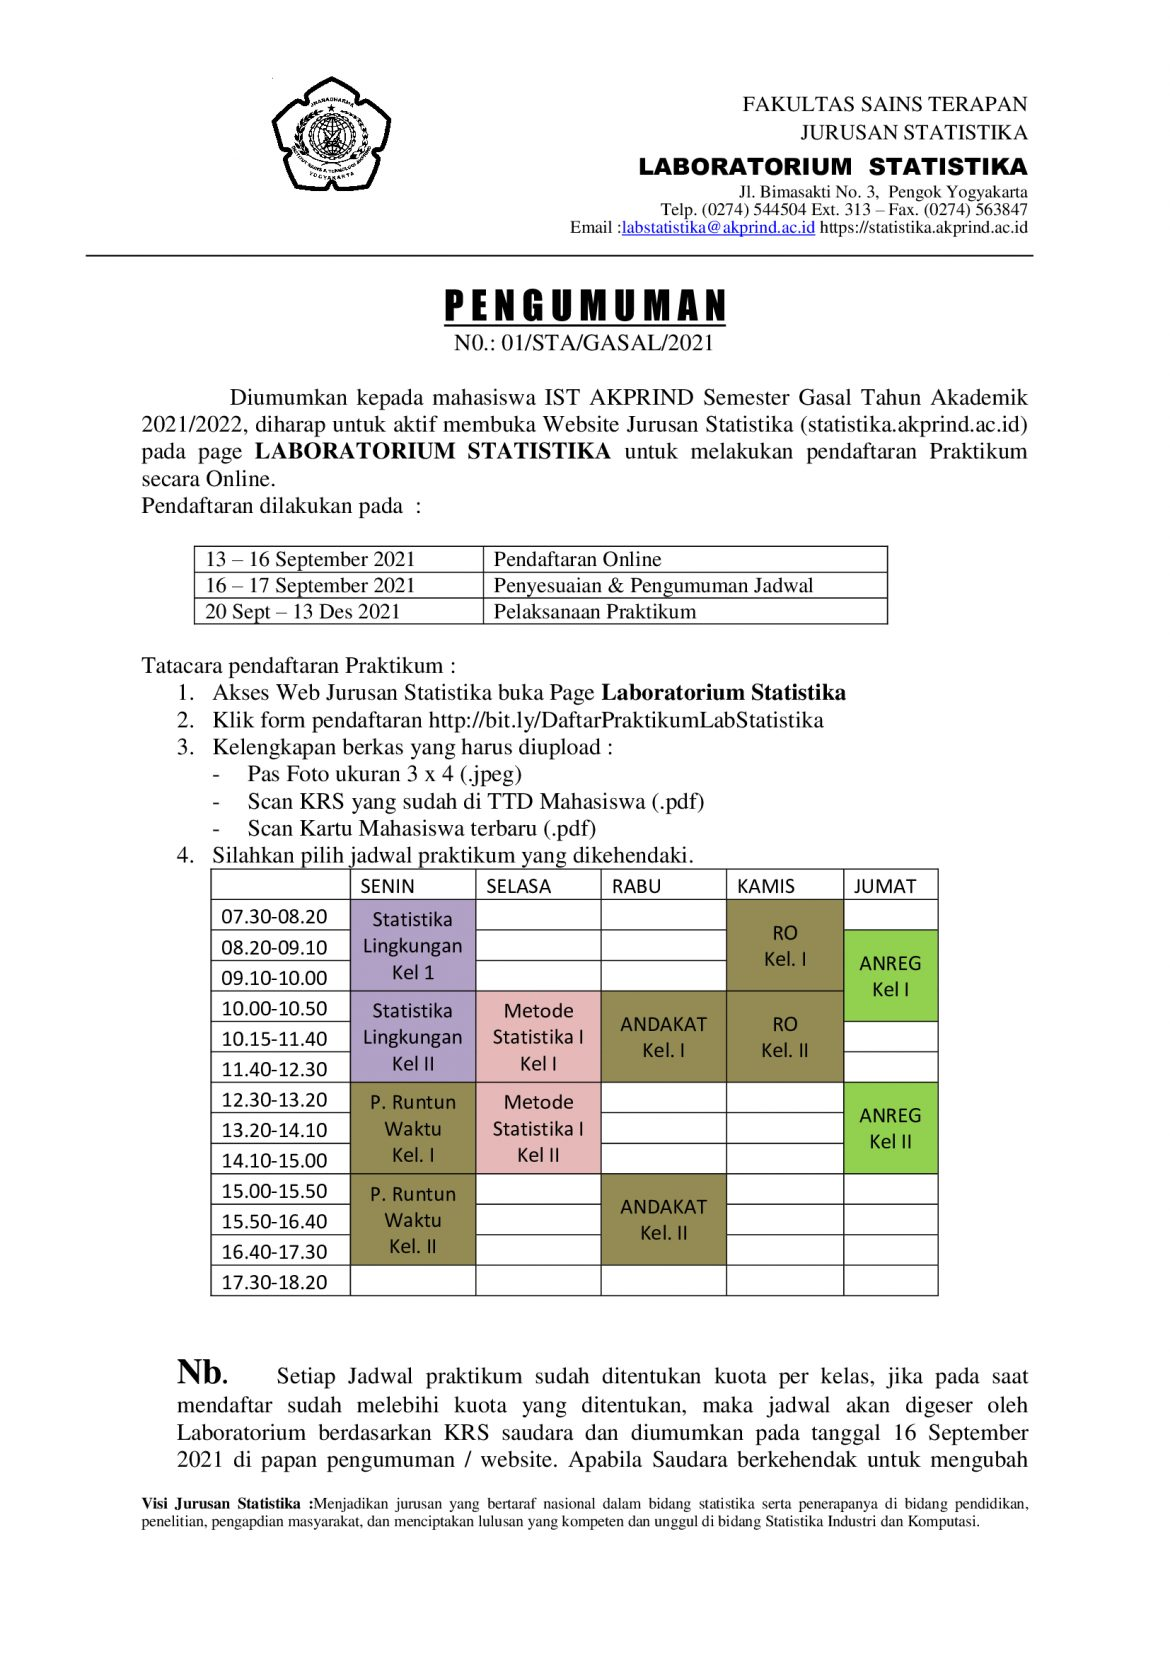 Pendaftaran Praktikum Semester Gasal 2021/2022